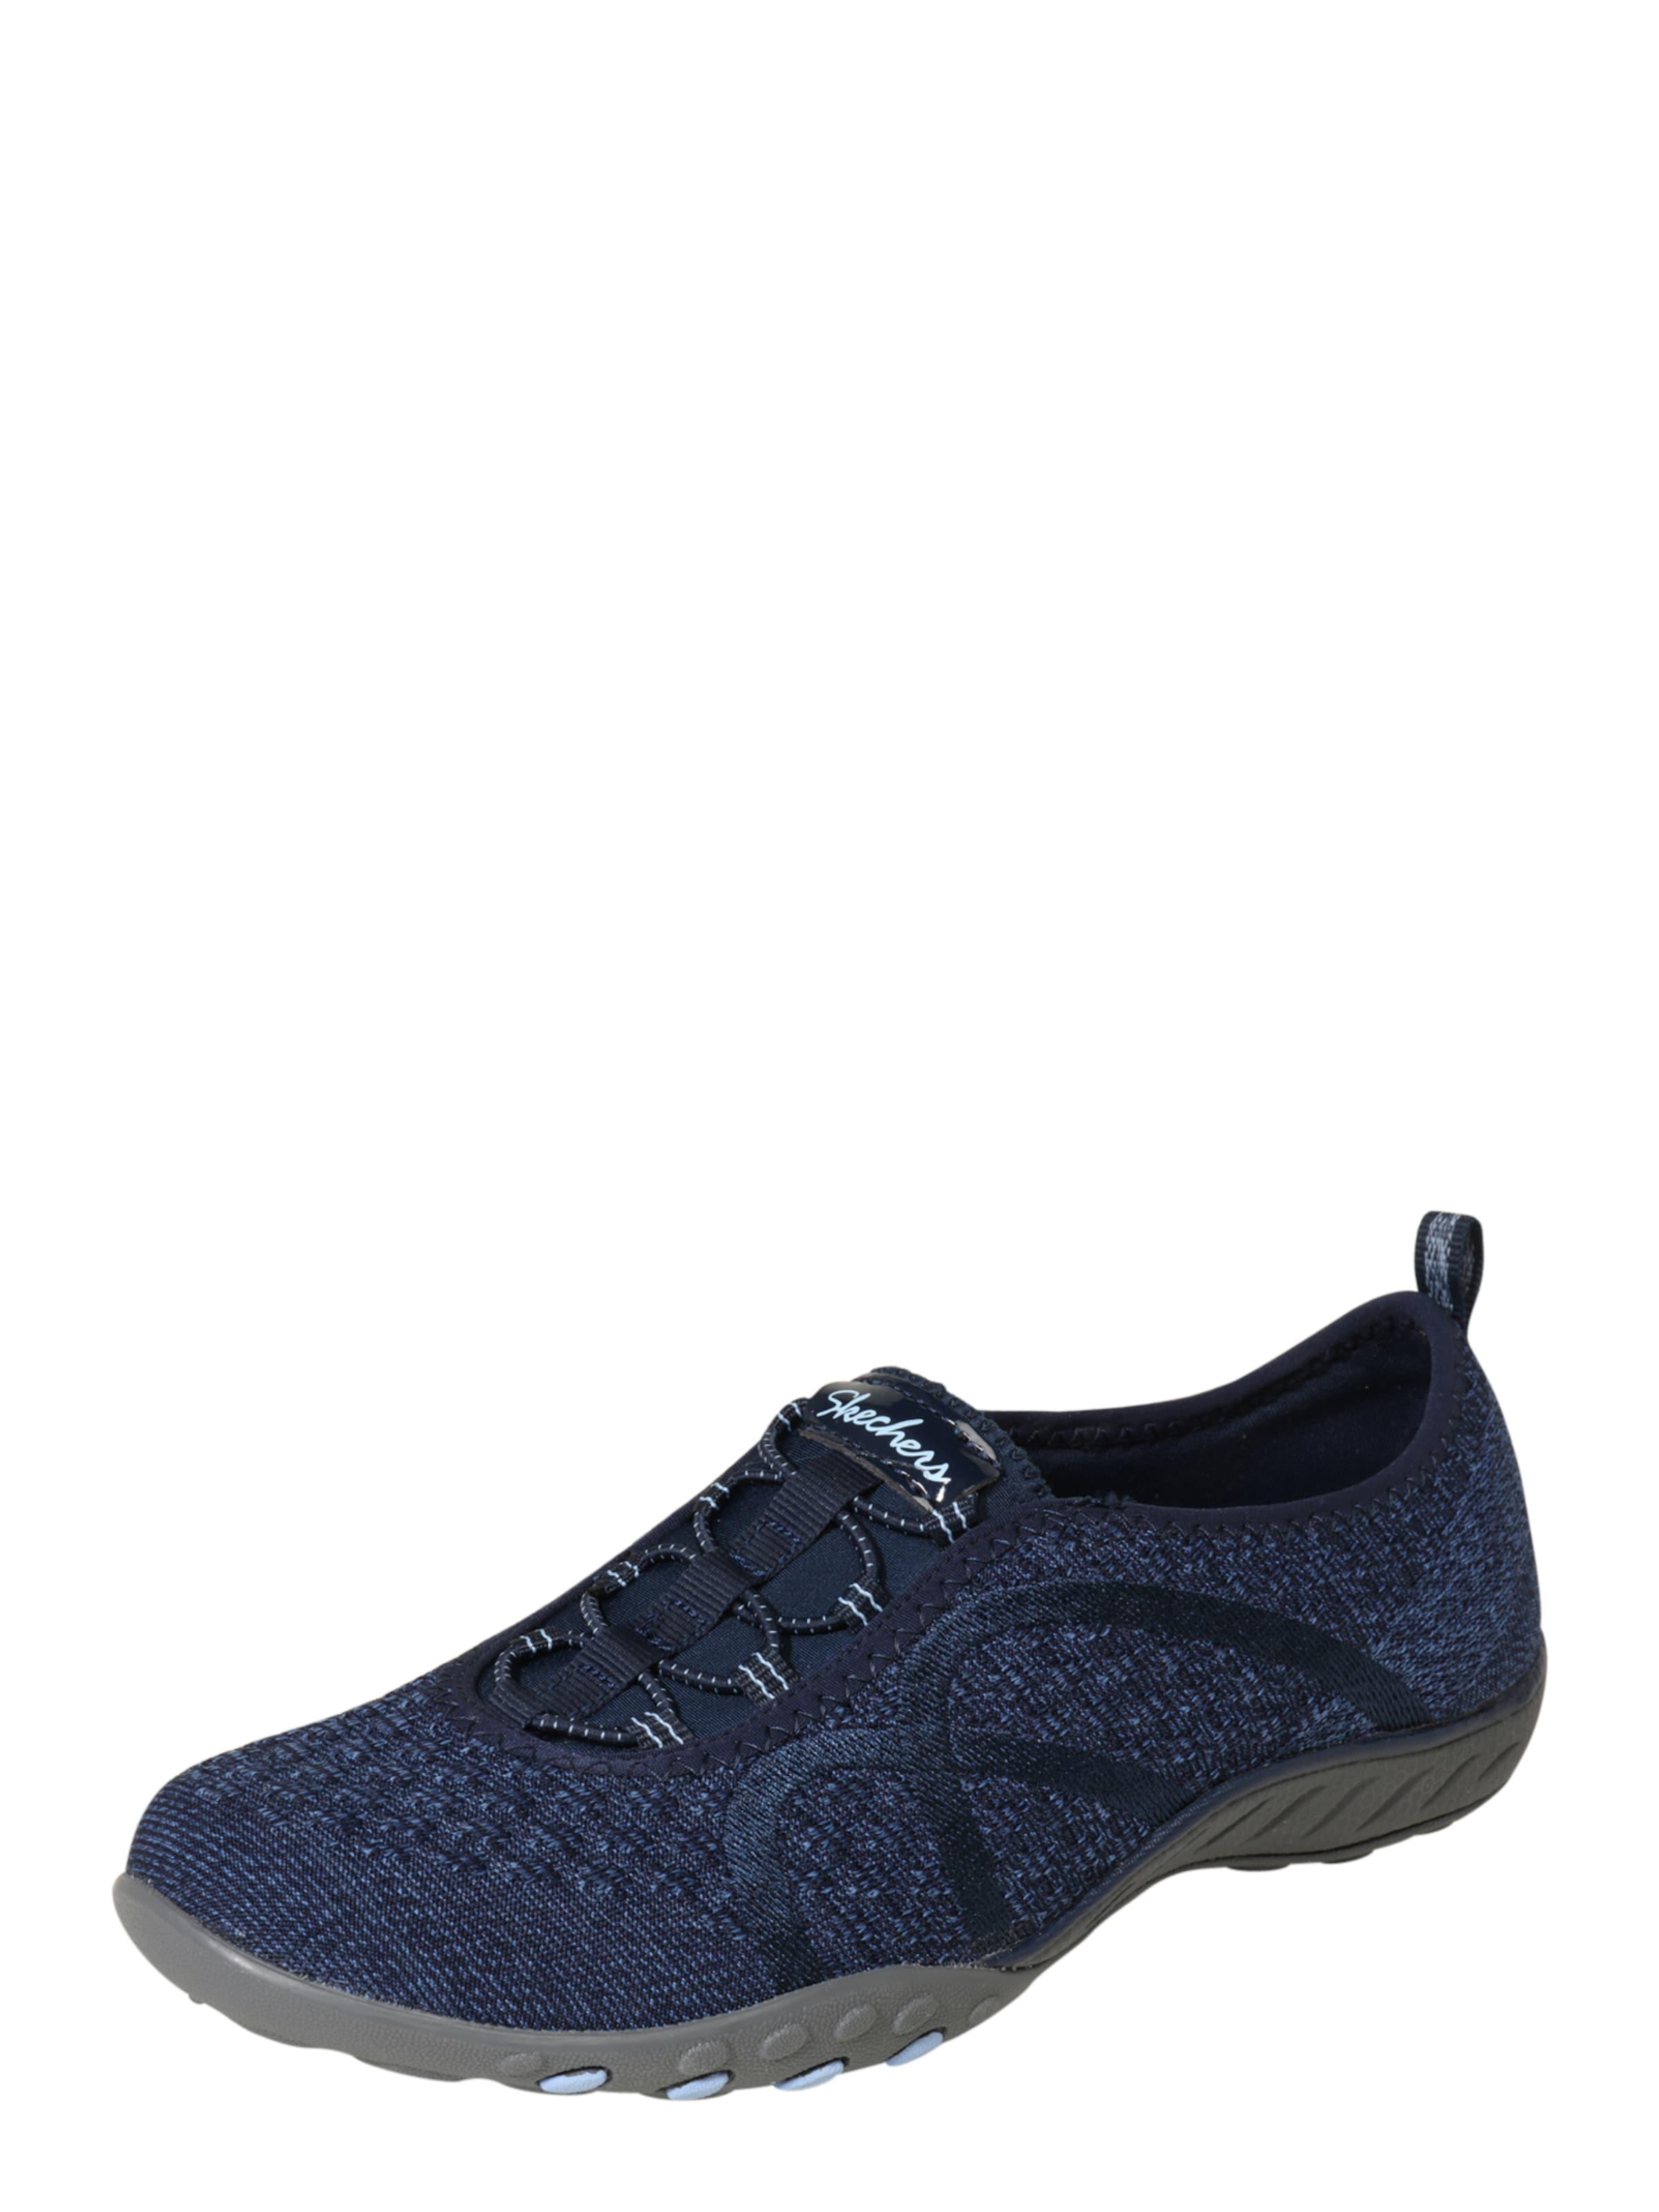 Skechers Marine Basses Bleu Baskets En IbgvfY67y